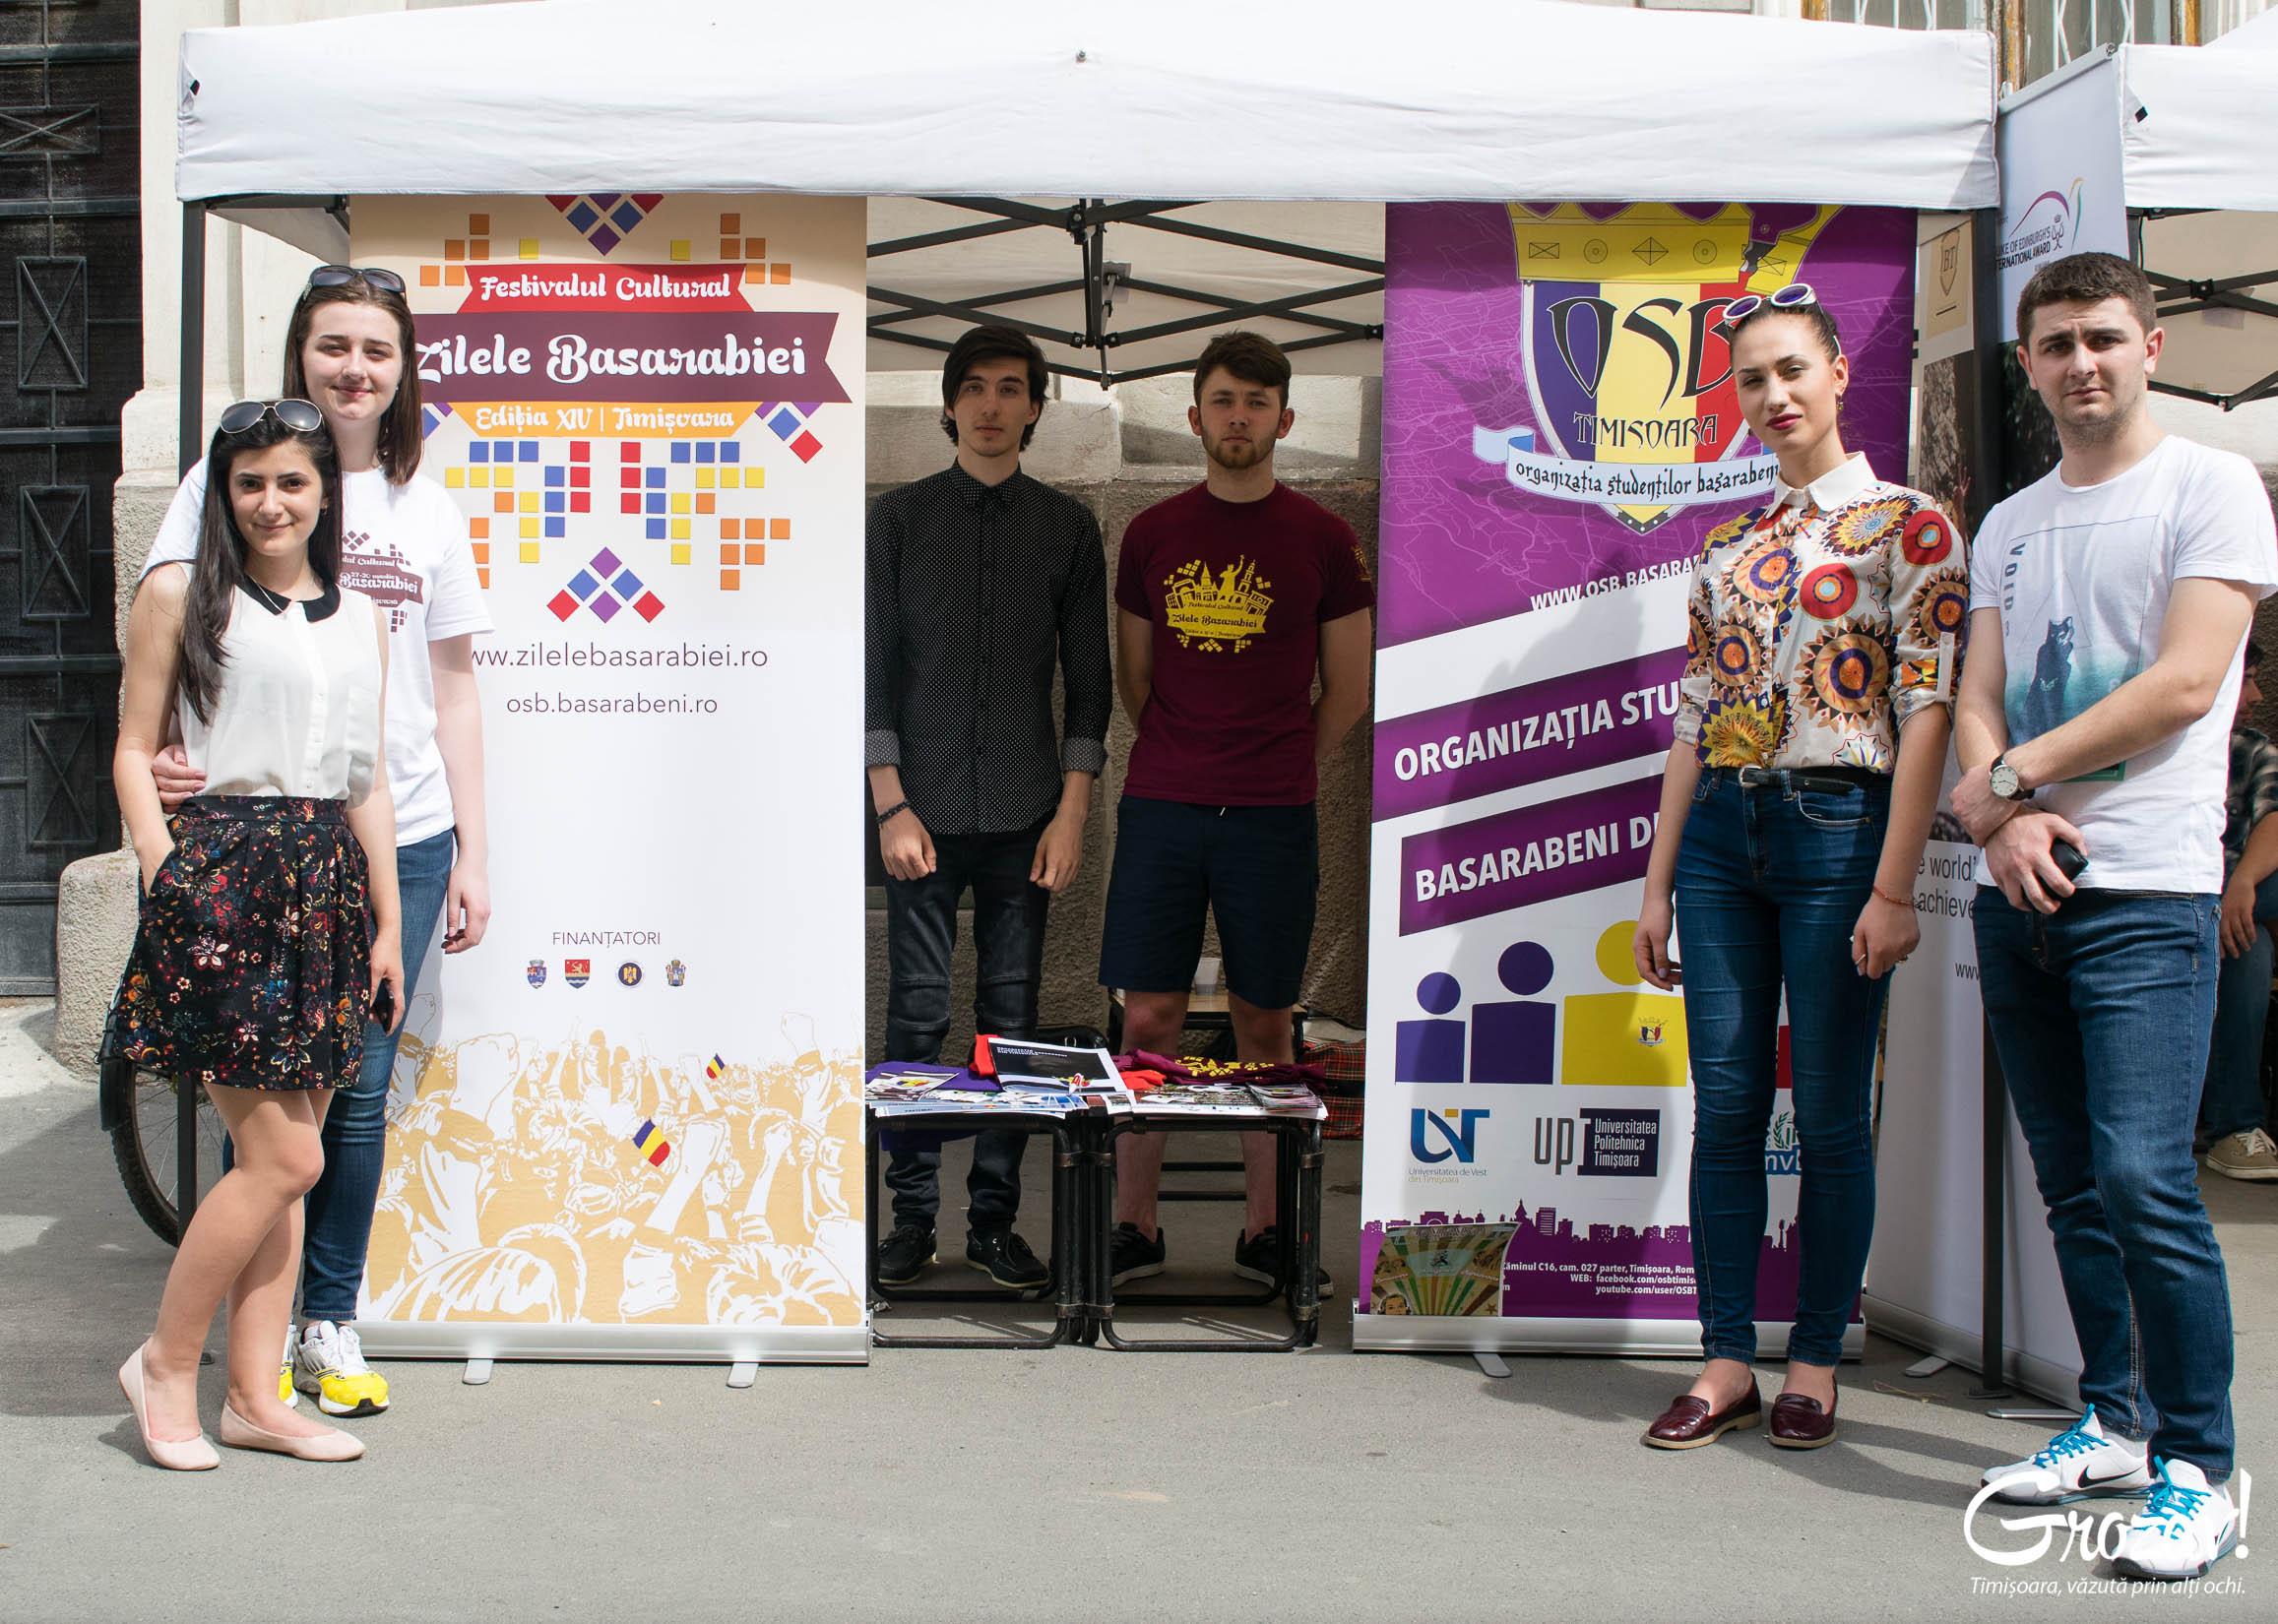 Organizatia Studentilor Basarabeni Targul ONG-urilor grozav